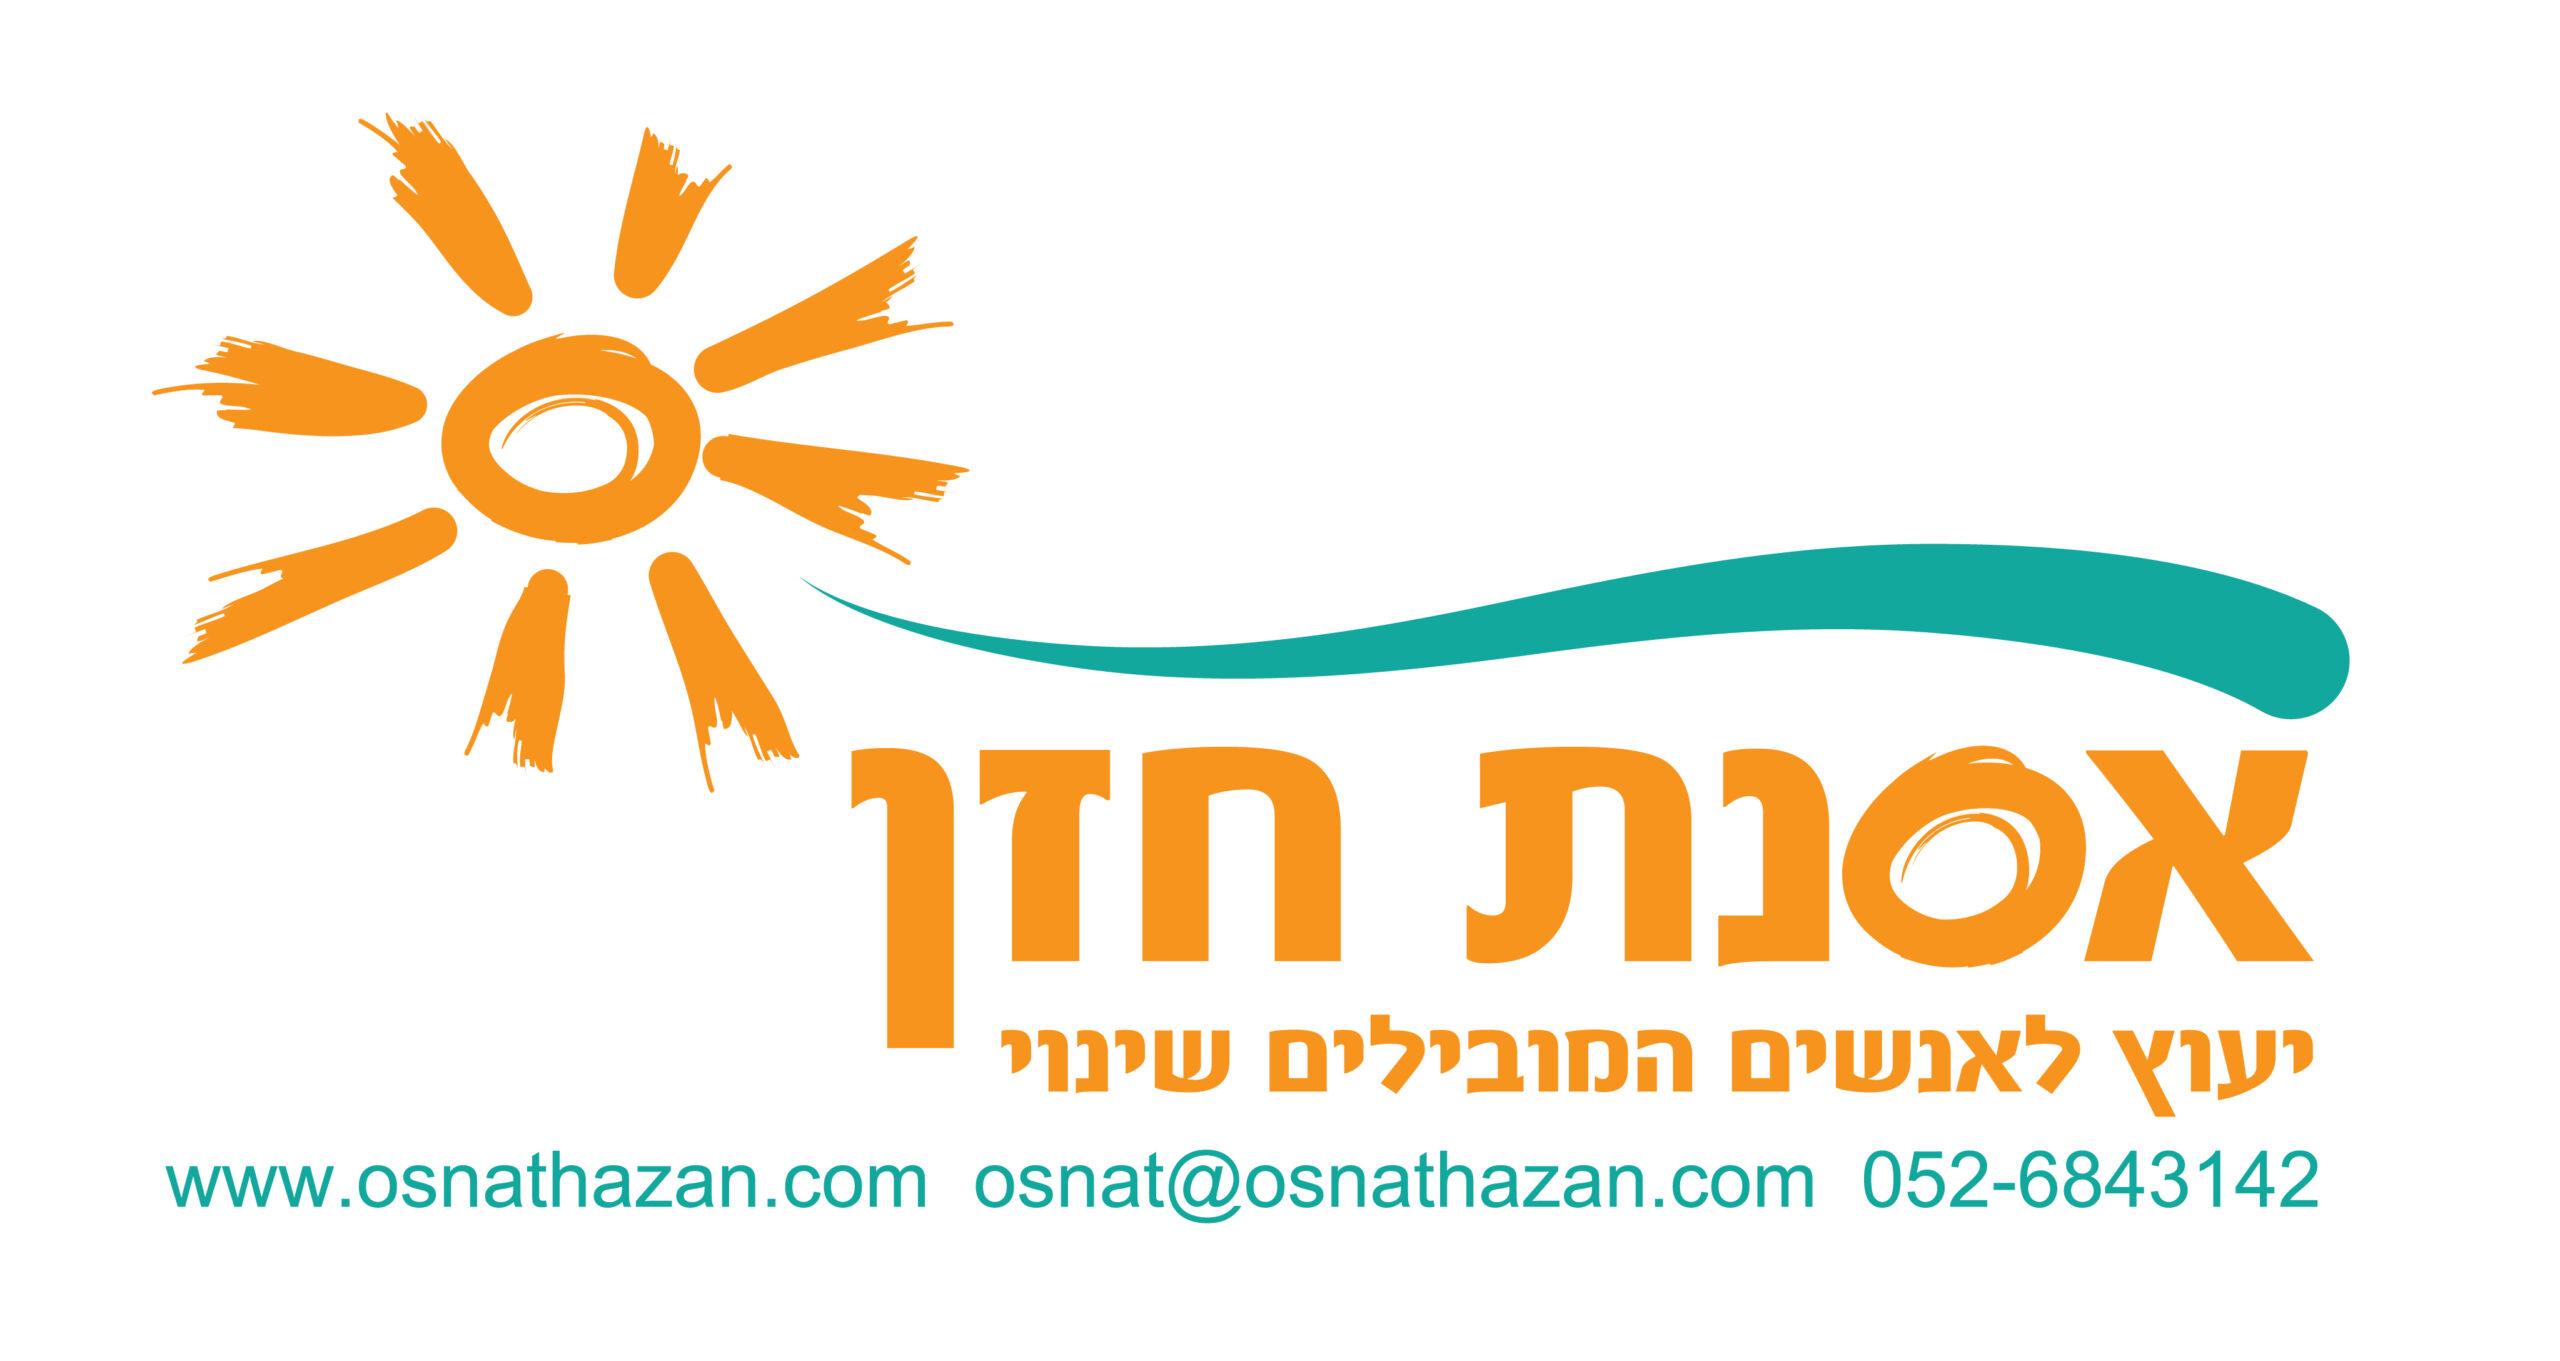 logo-osnat-hazan-phone-scaled-1.jpg